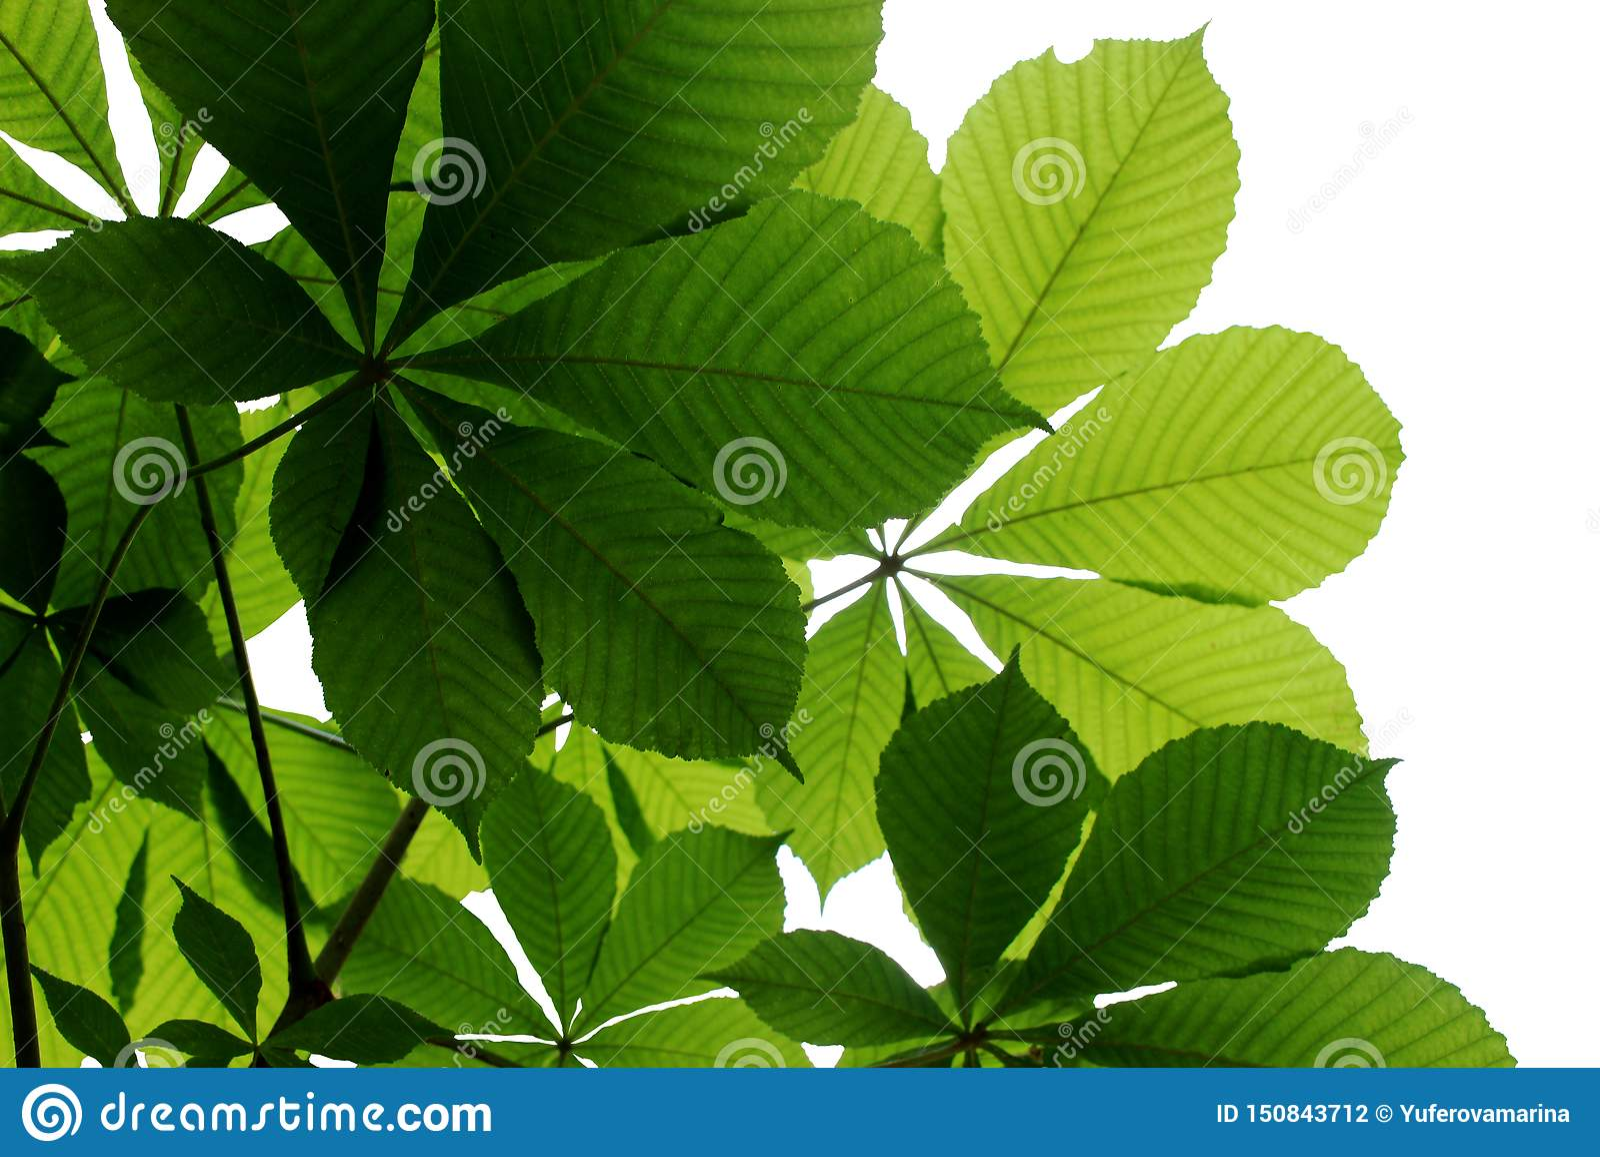 Ljust - gröna kastanjebruna sidor på en vit bakgrund